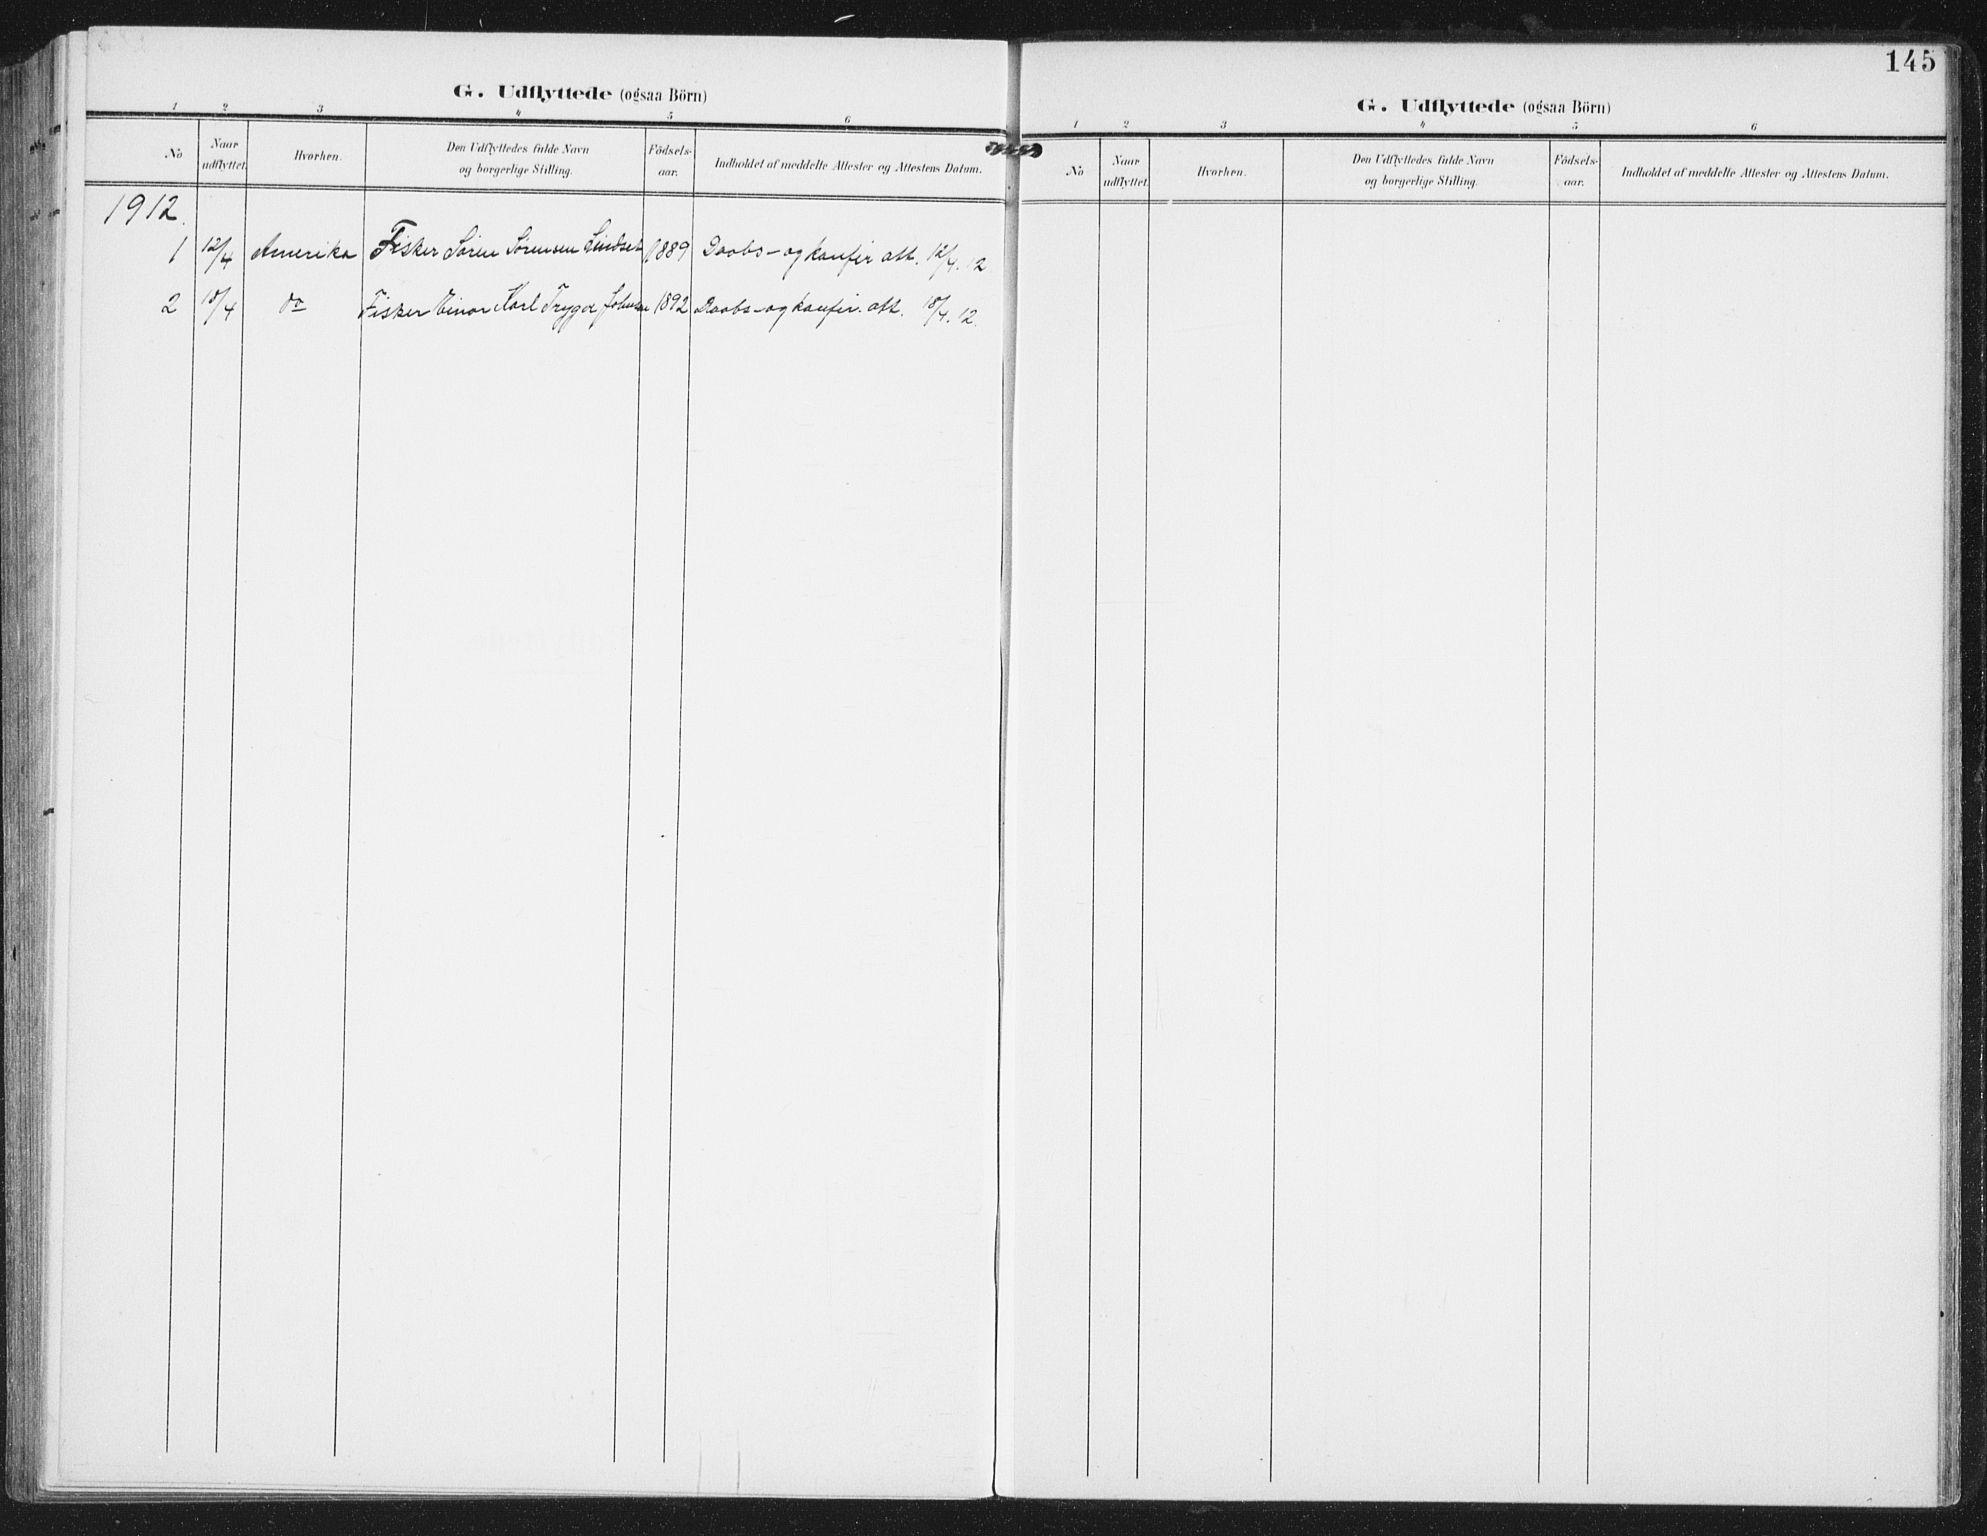 SAT, Ministerialprotokoller, klokkerbøker og fødselsregistre - Nordland, 886/L1221: Ministerialbok nr. 886A03, 1903-1913, s. 145